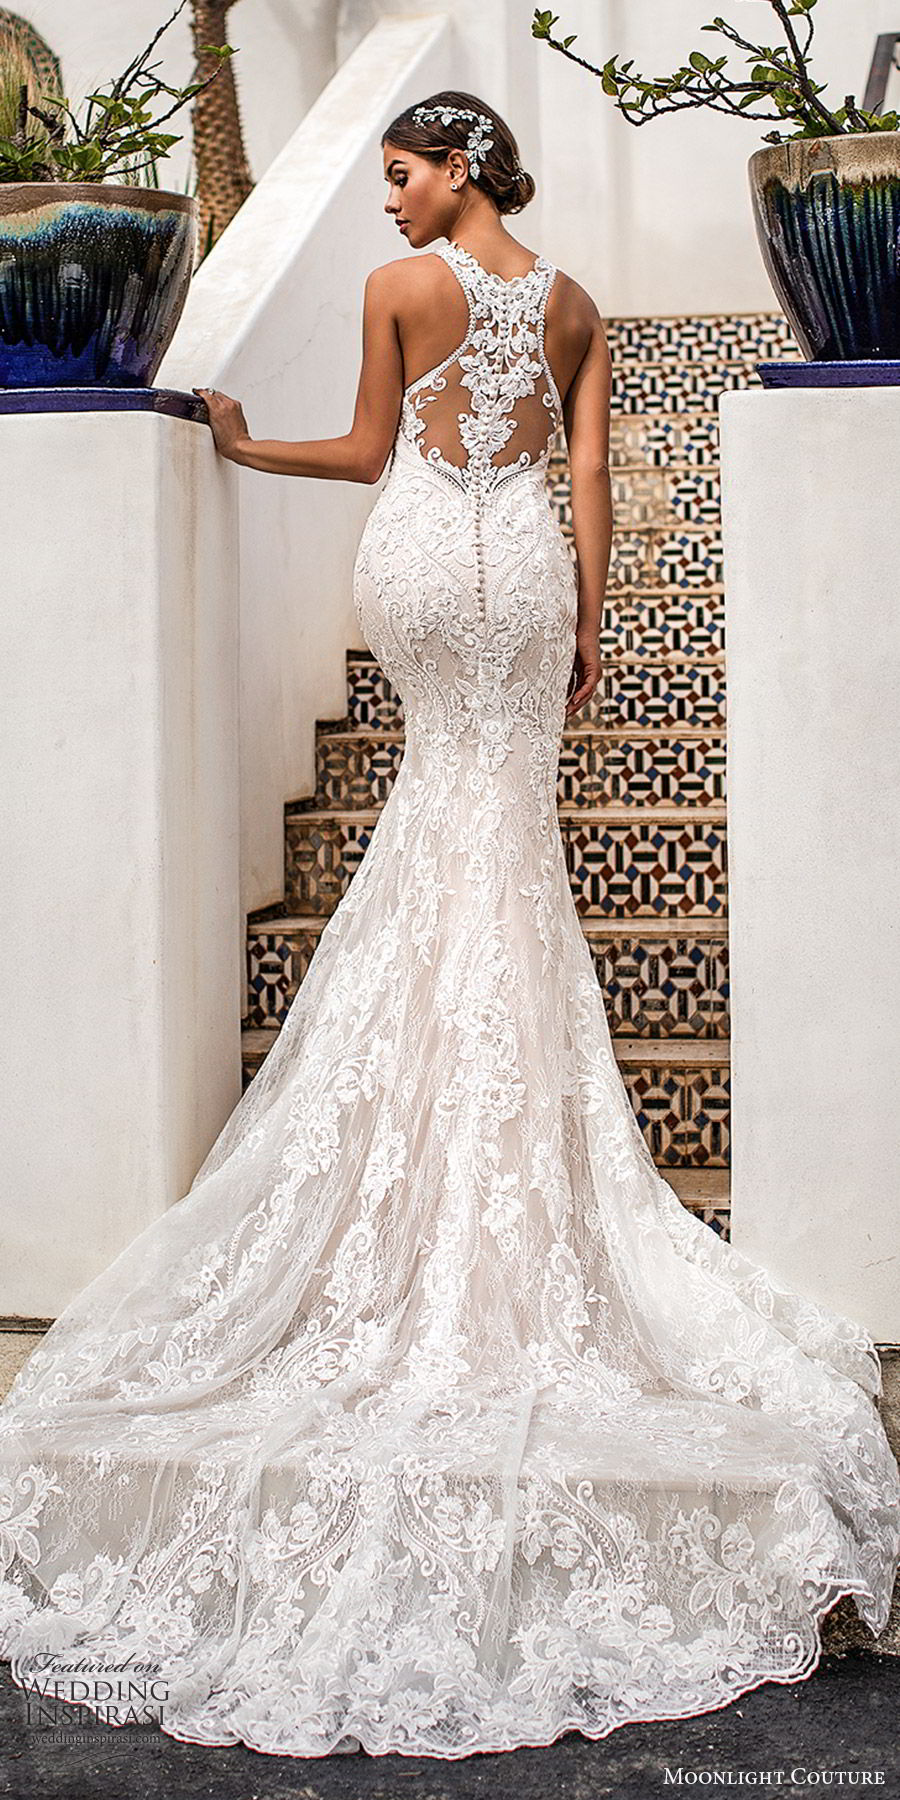 moonlight couture fall 2019 bridal sleeveless illusion hatler neckline fully embellished lace sheath mermaid wedding dress (6) glitzy glam elegant illusion back chapel train bv